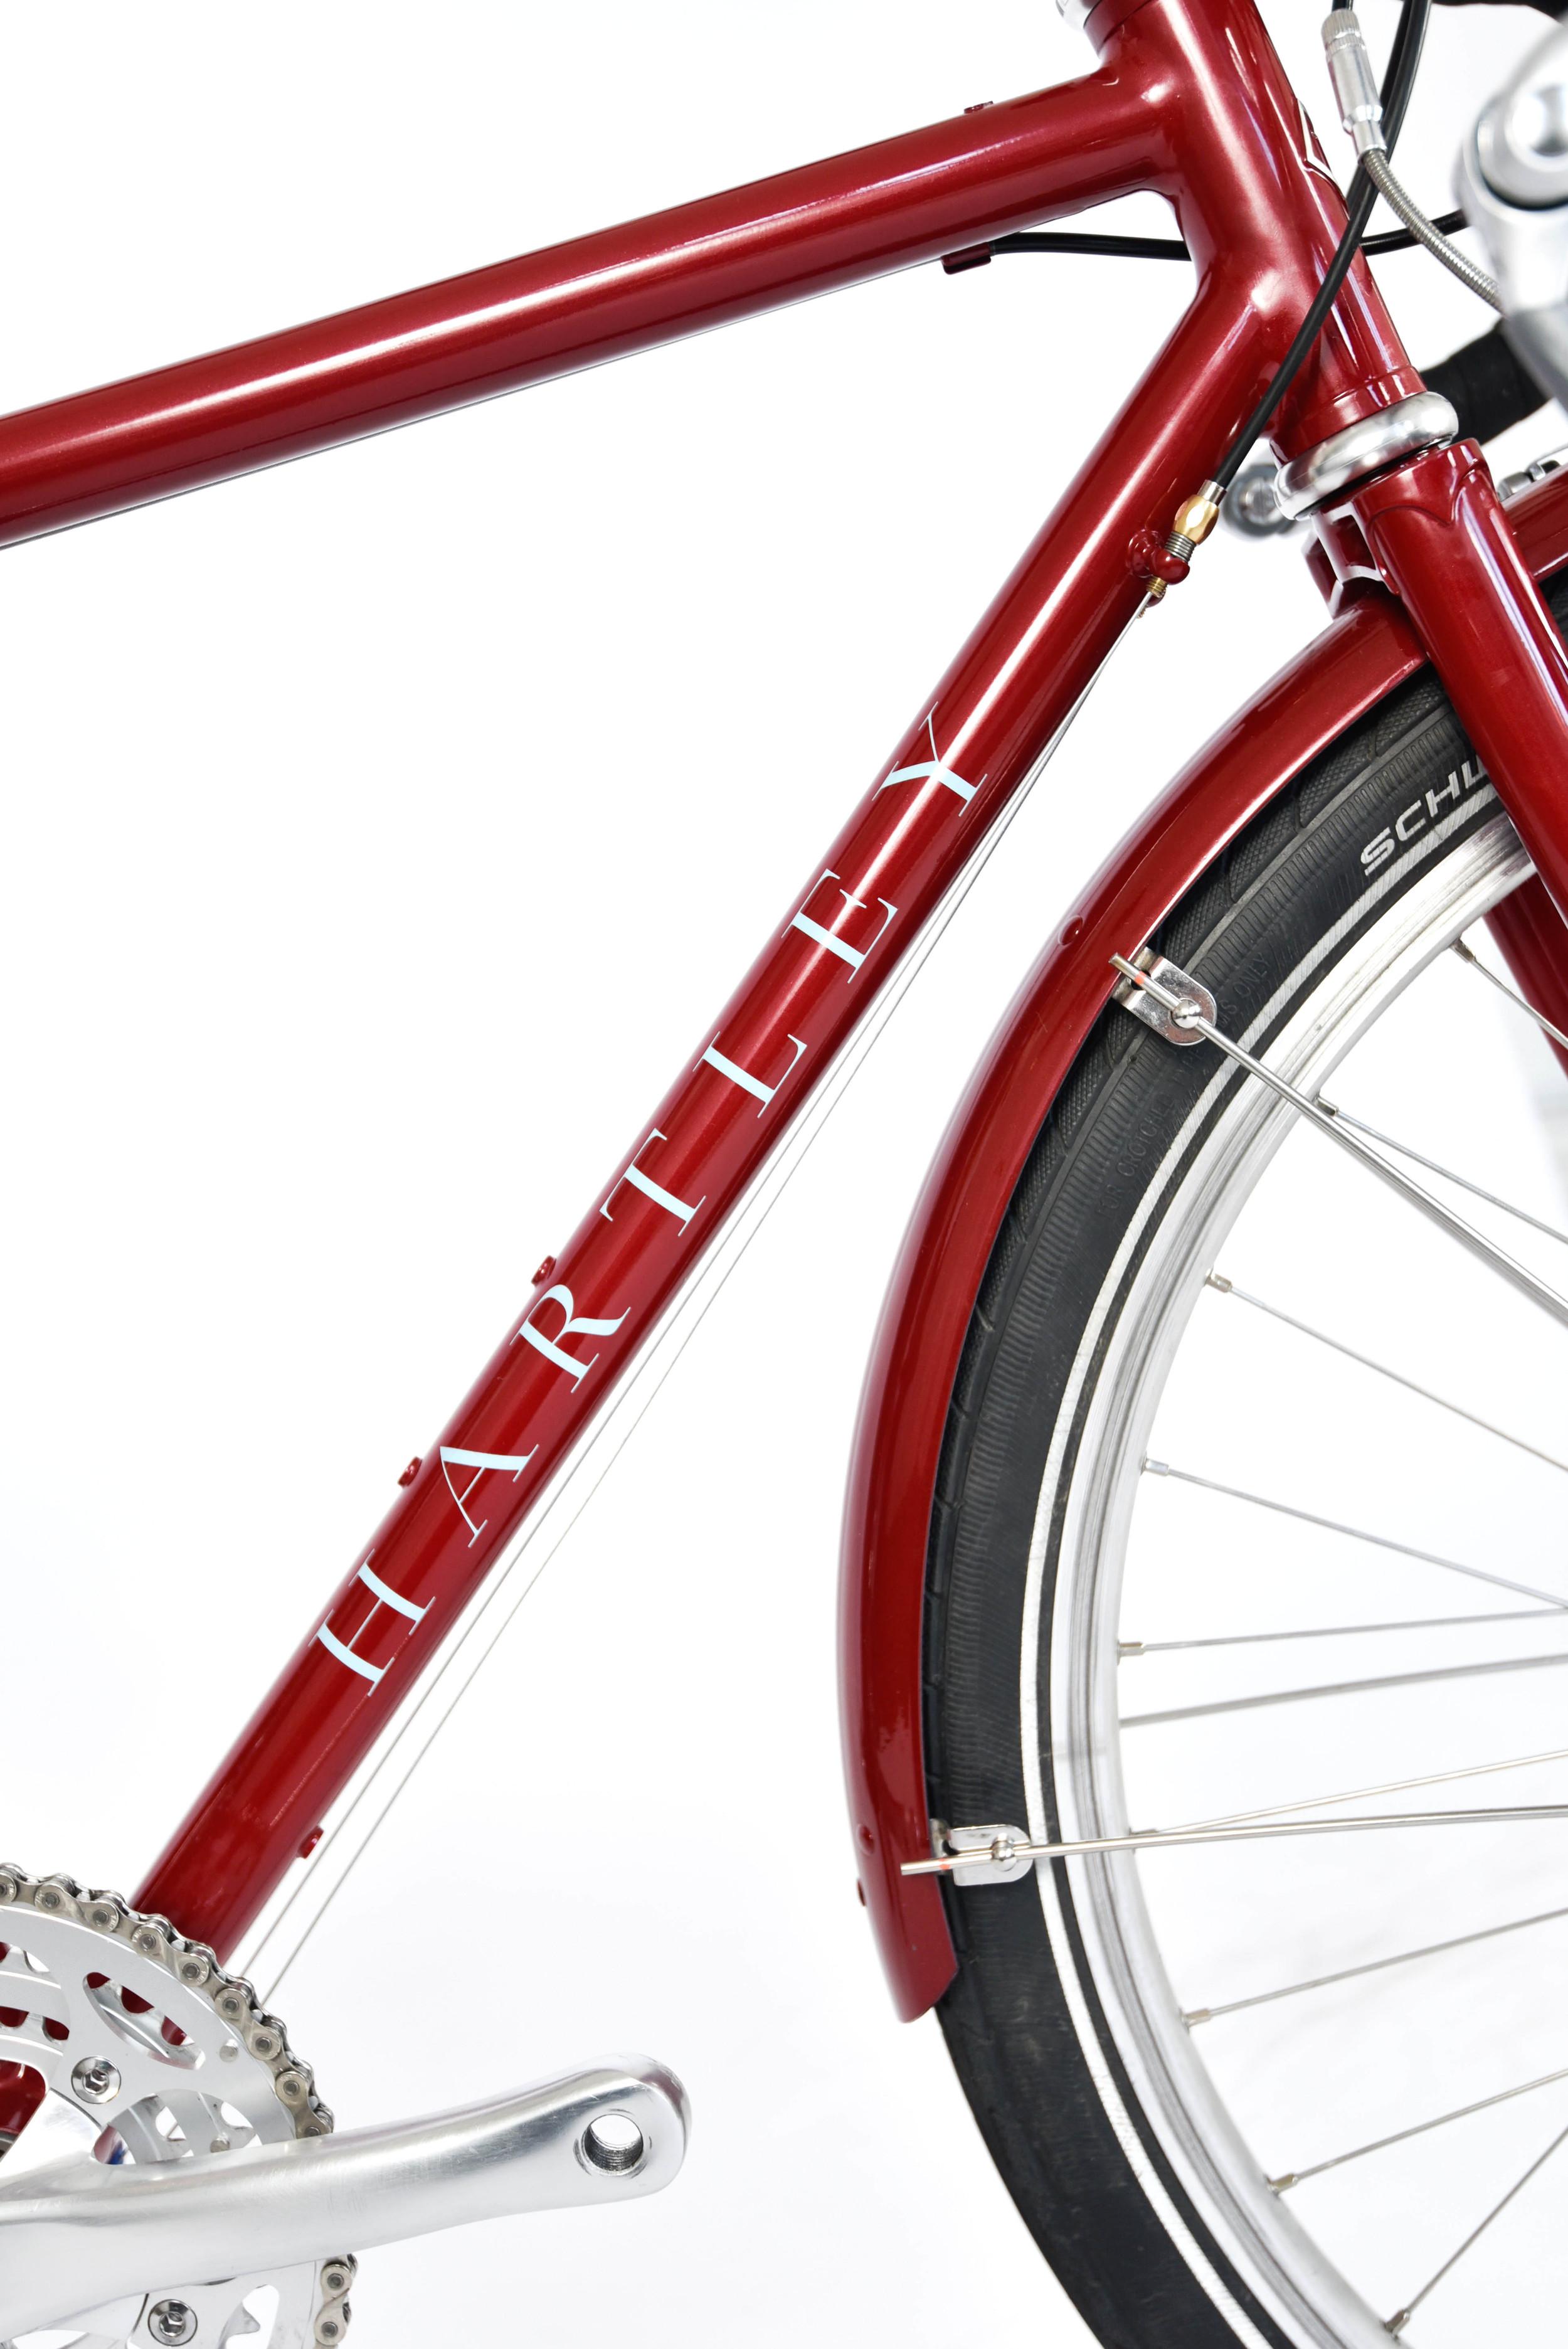 853 mini touring bike bespoke hartley london